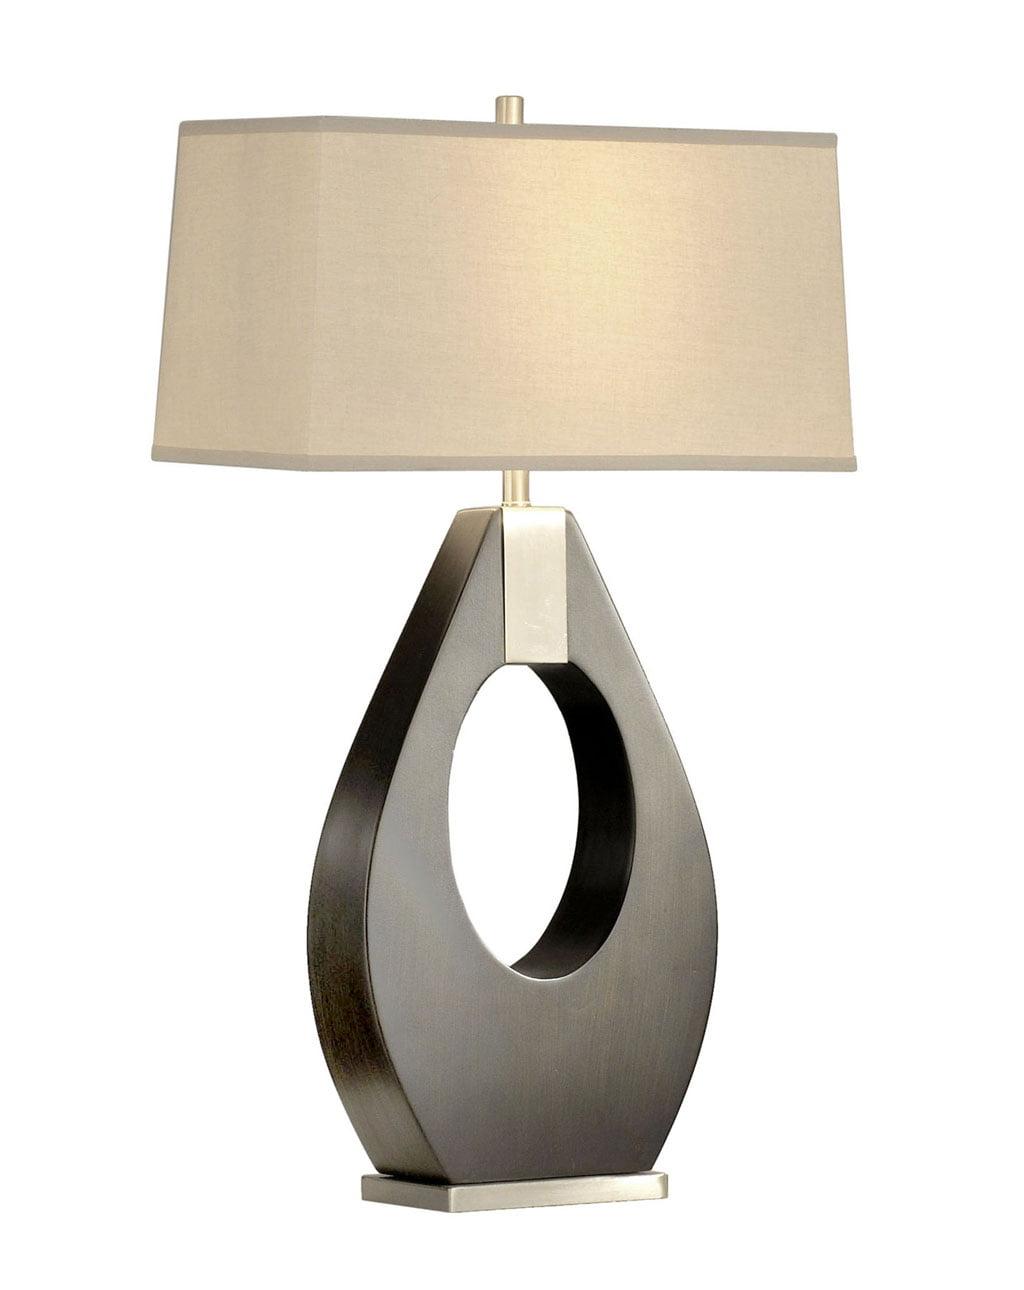 Pearson Table Lamp, Pecan